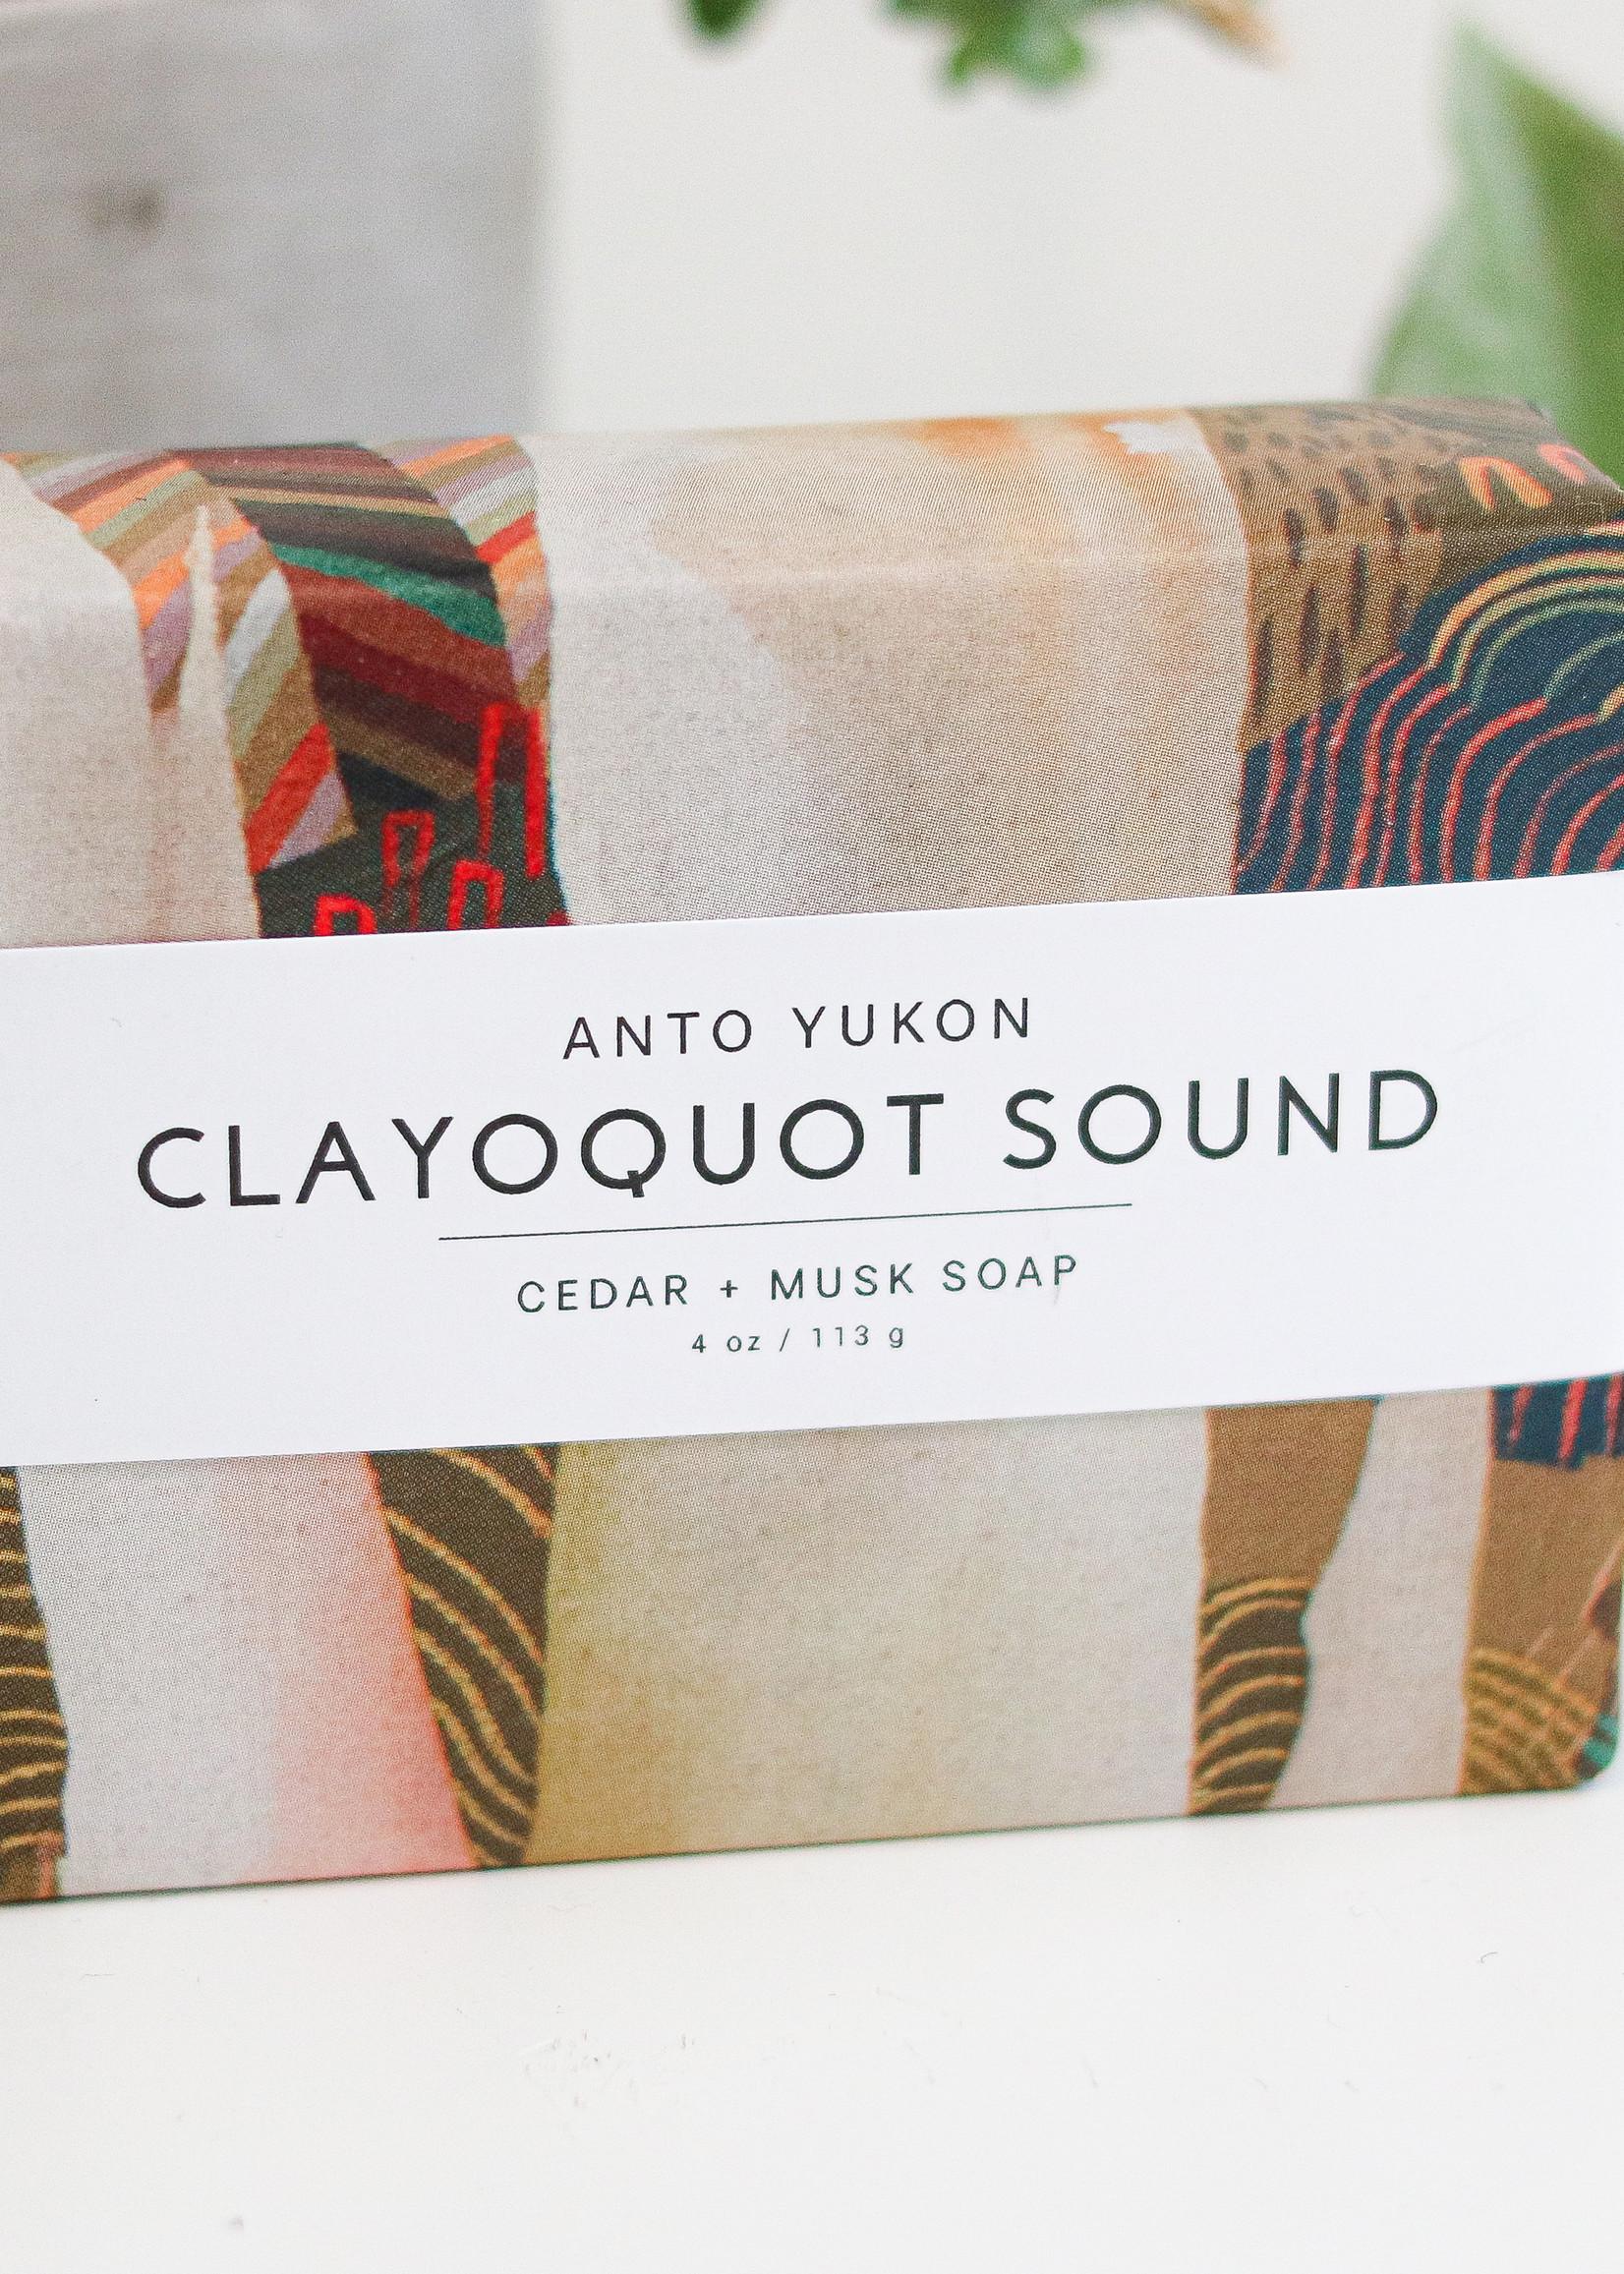 Anto Yukon Anto Yukon - Clayoquot Sound Soap